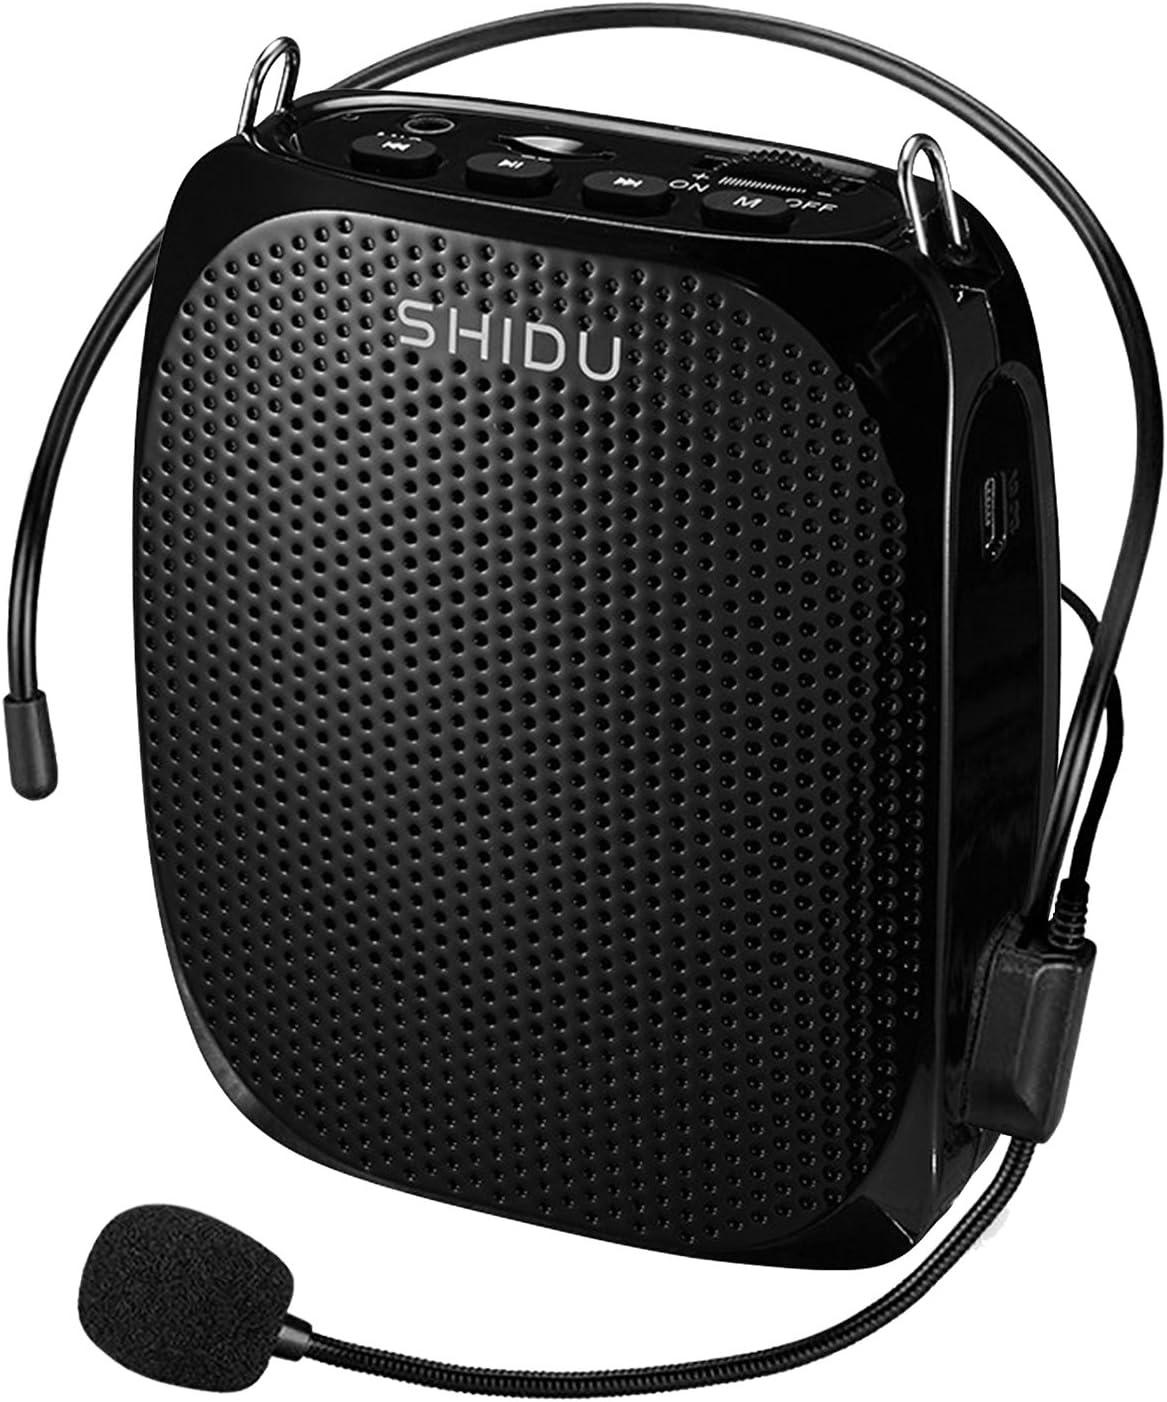 Portable Voice Amplifier 10W Rechargable Wireless Microphone